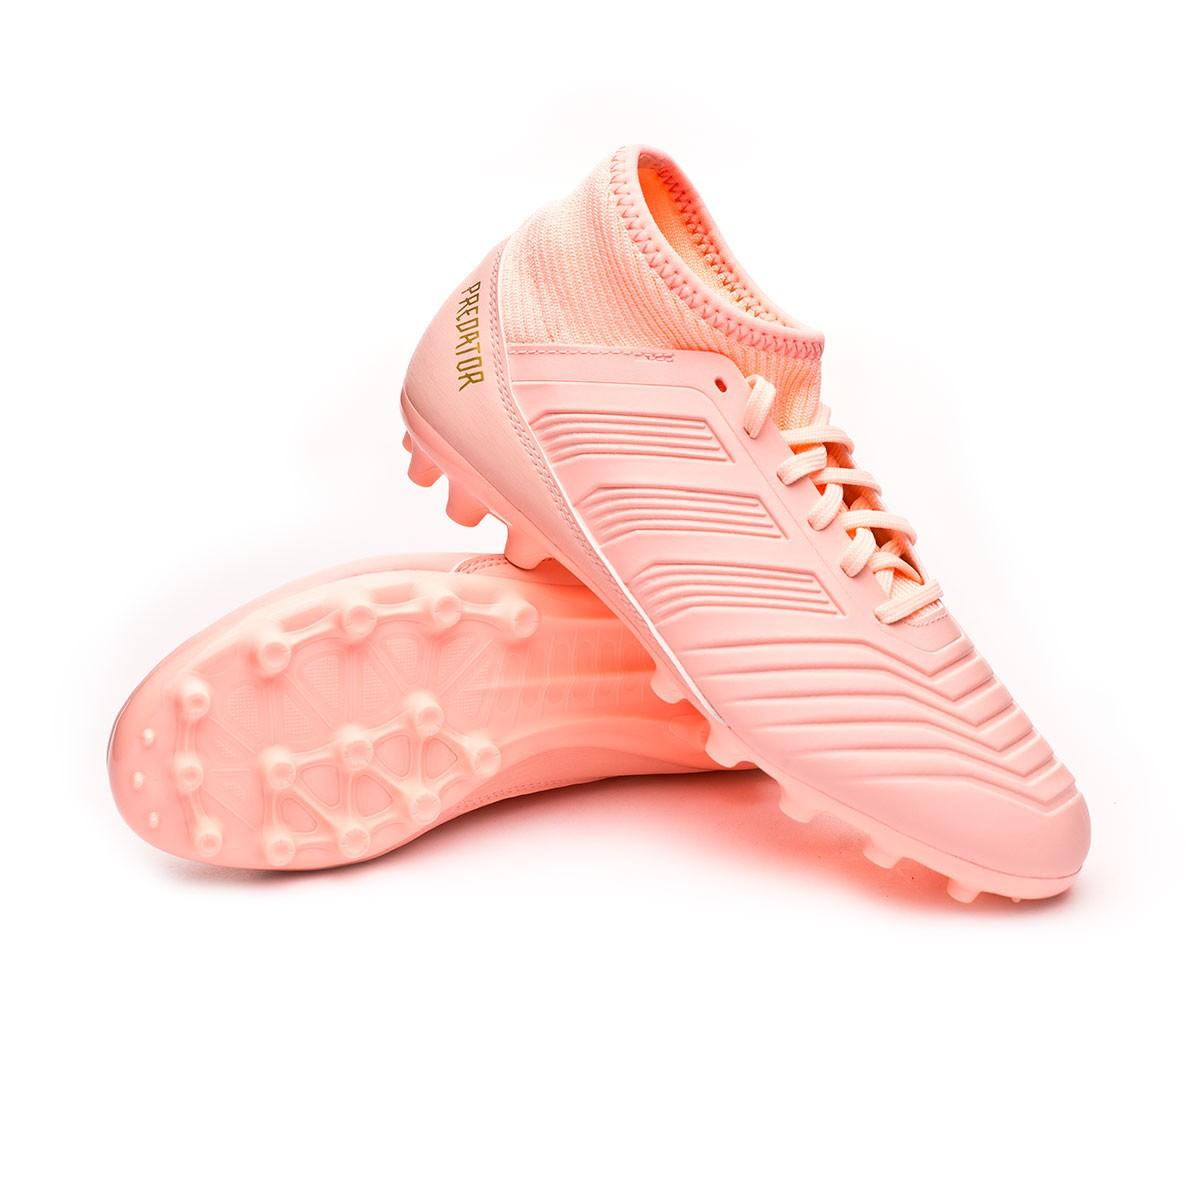 8f77ec912f55 Football Boots adidas Kids Predator 18.3 AG Clear orange-Trace pink -  Football store Fútbol Emotion